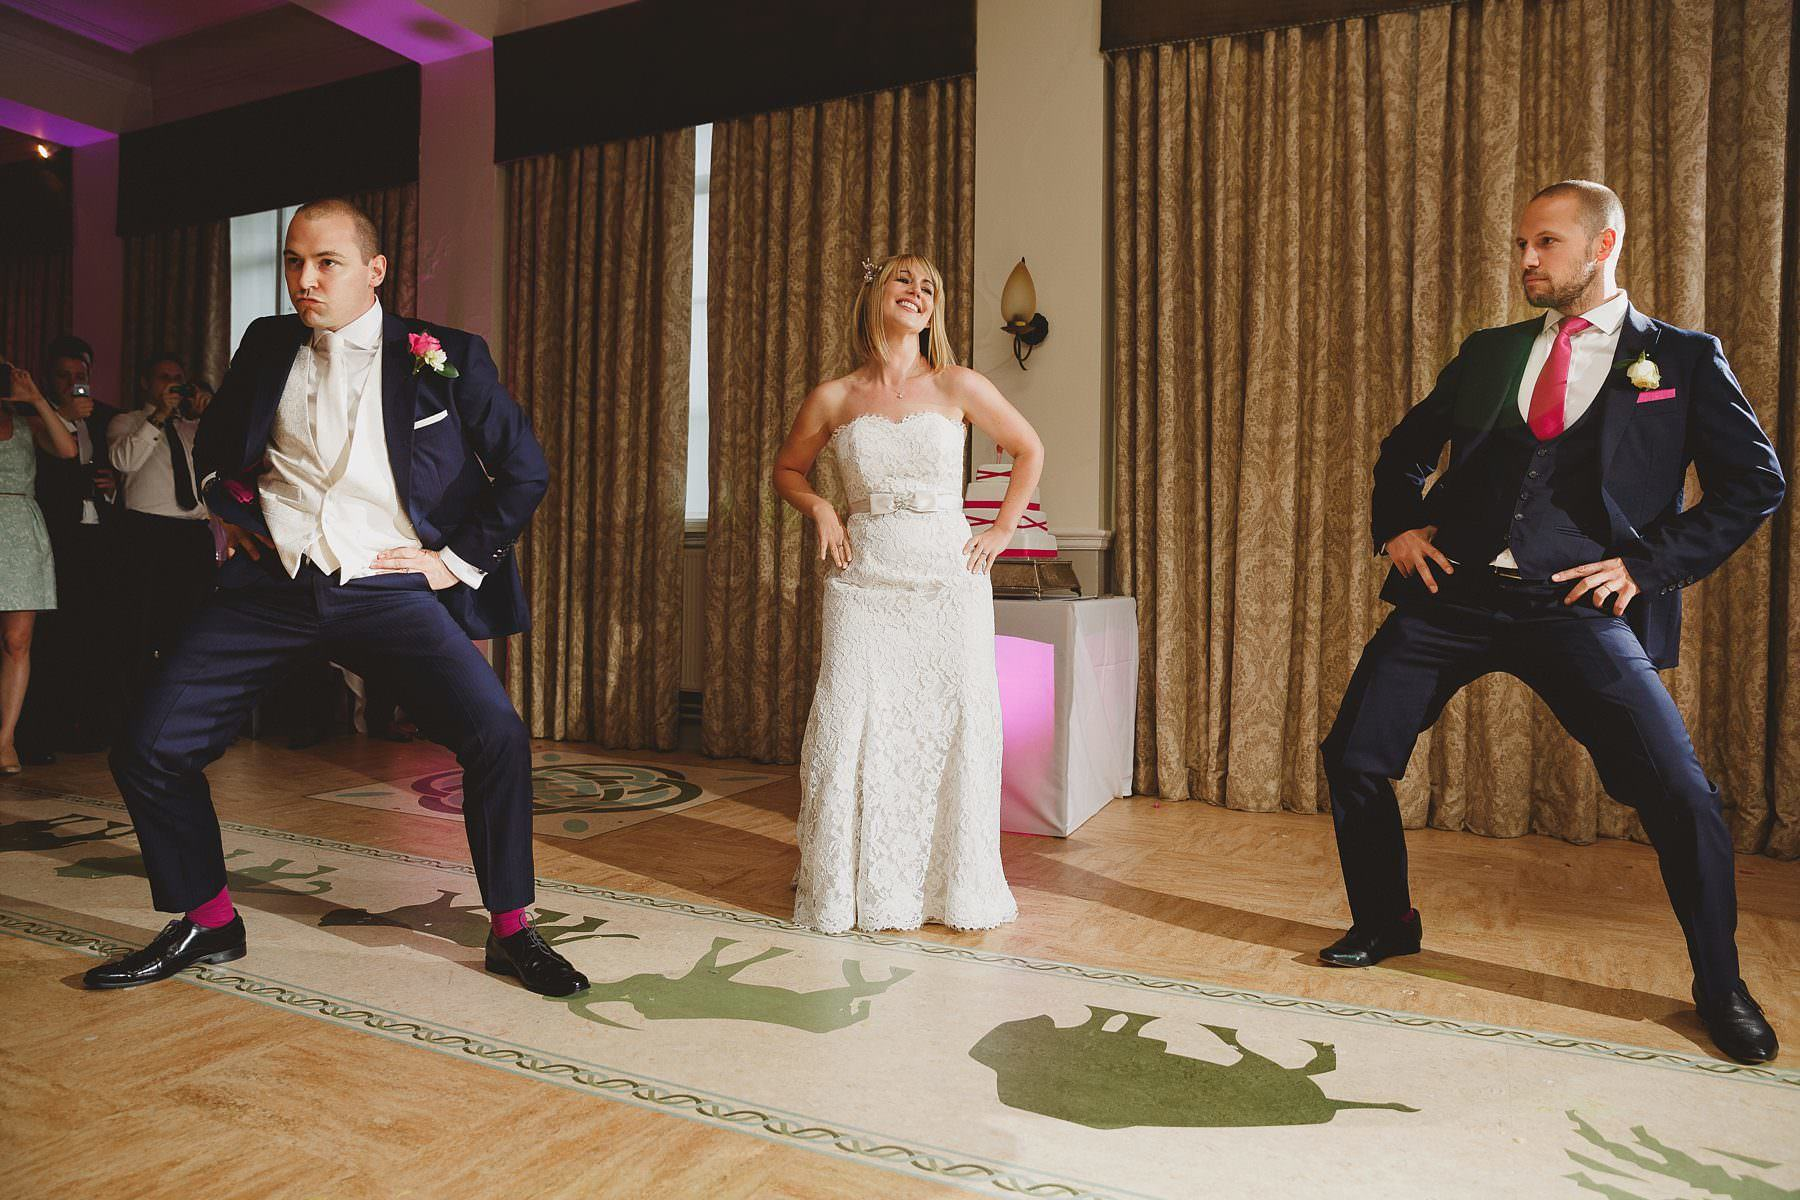 weddings-at-bristol-zoo-053